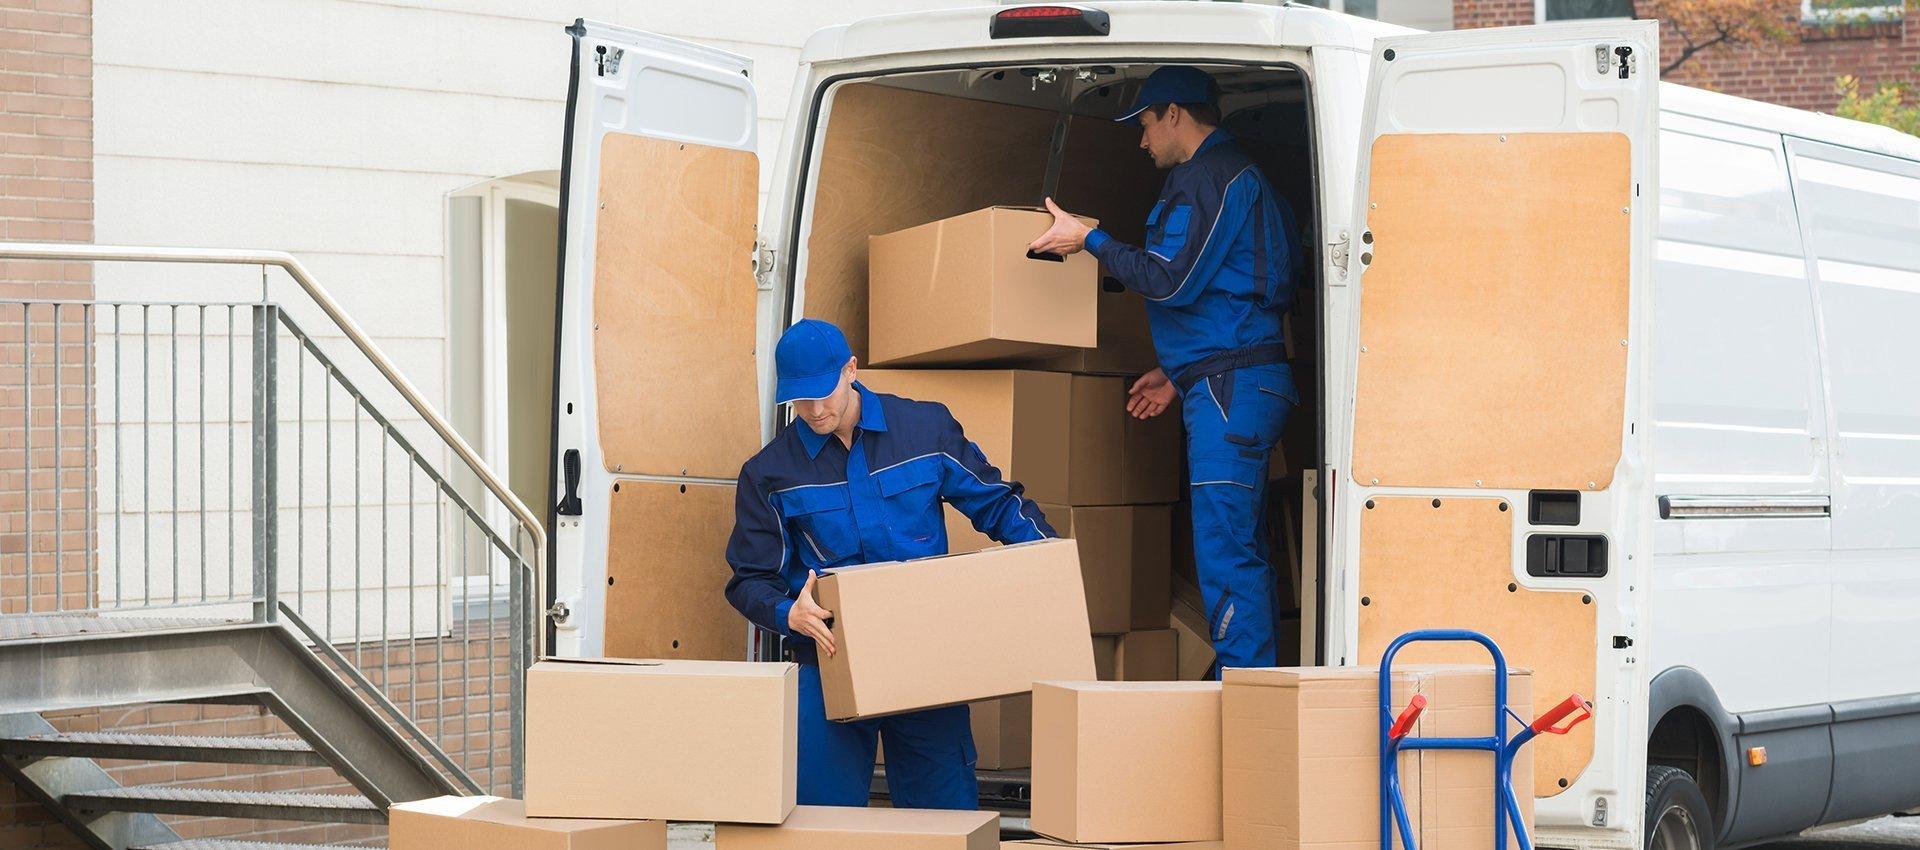 men loading boxes in a van